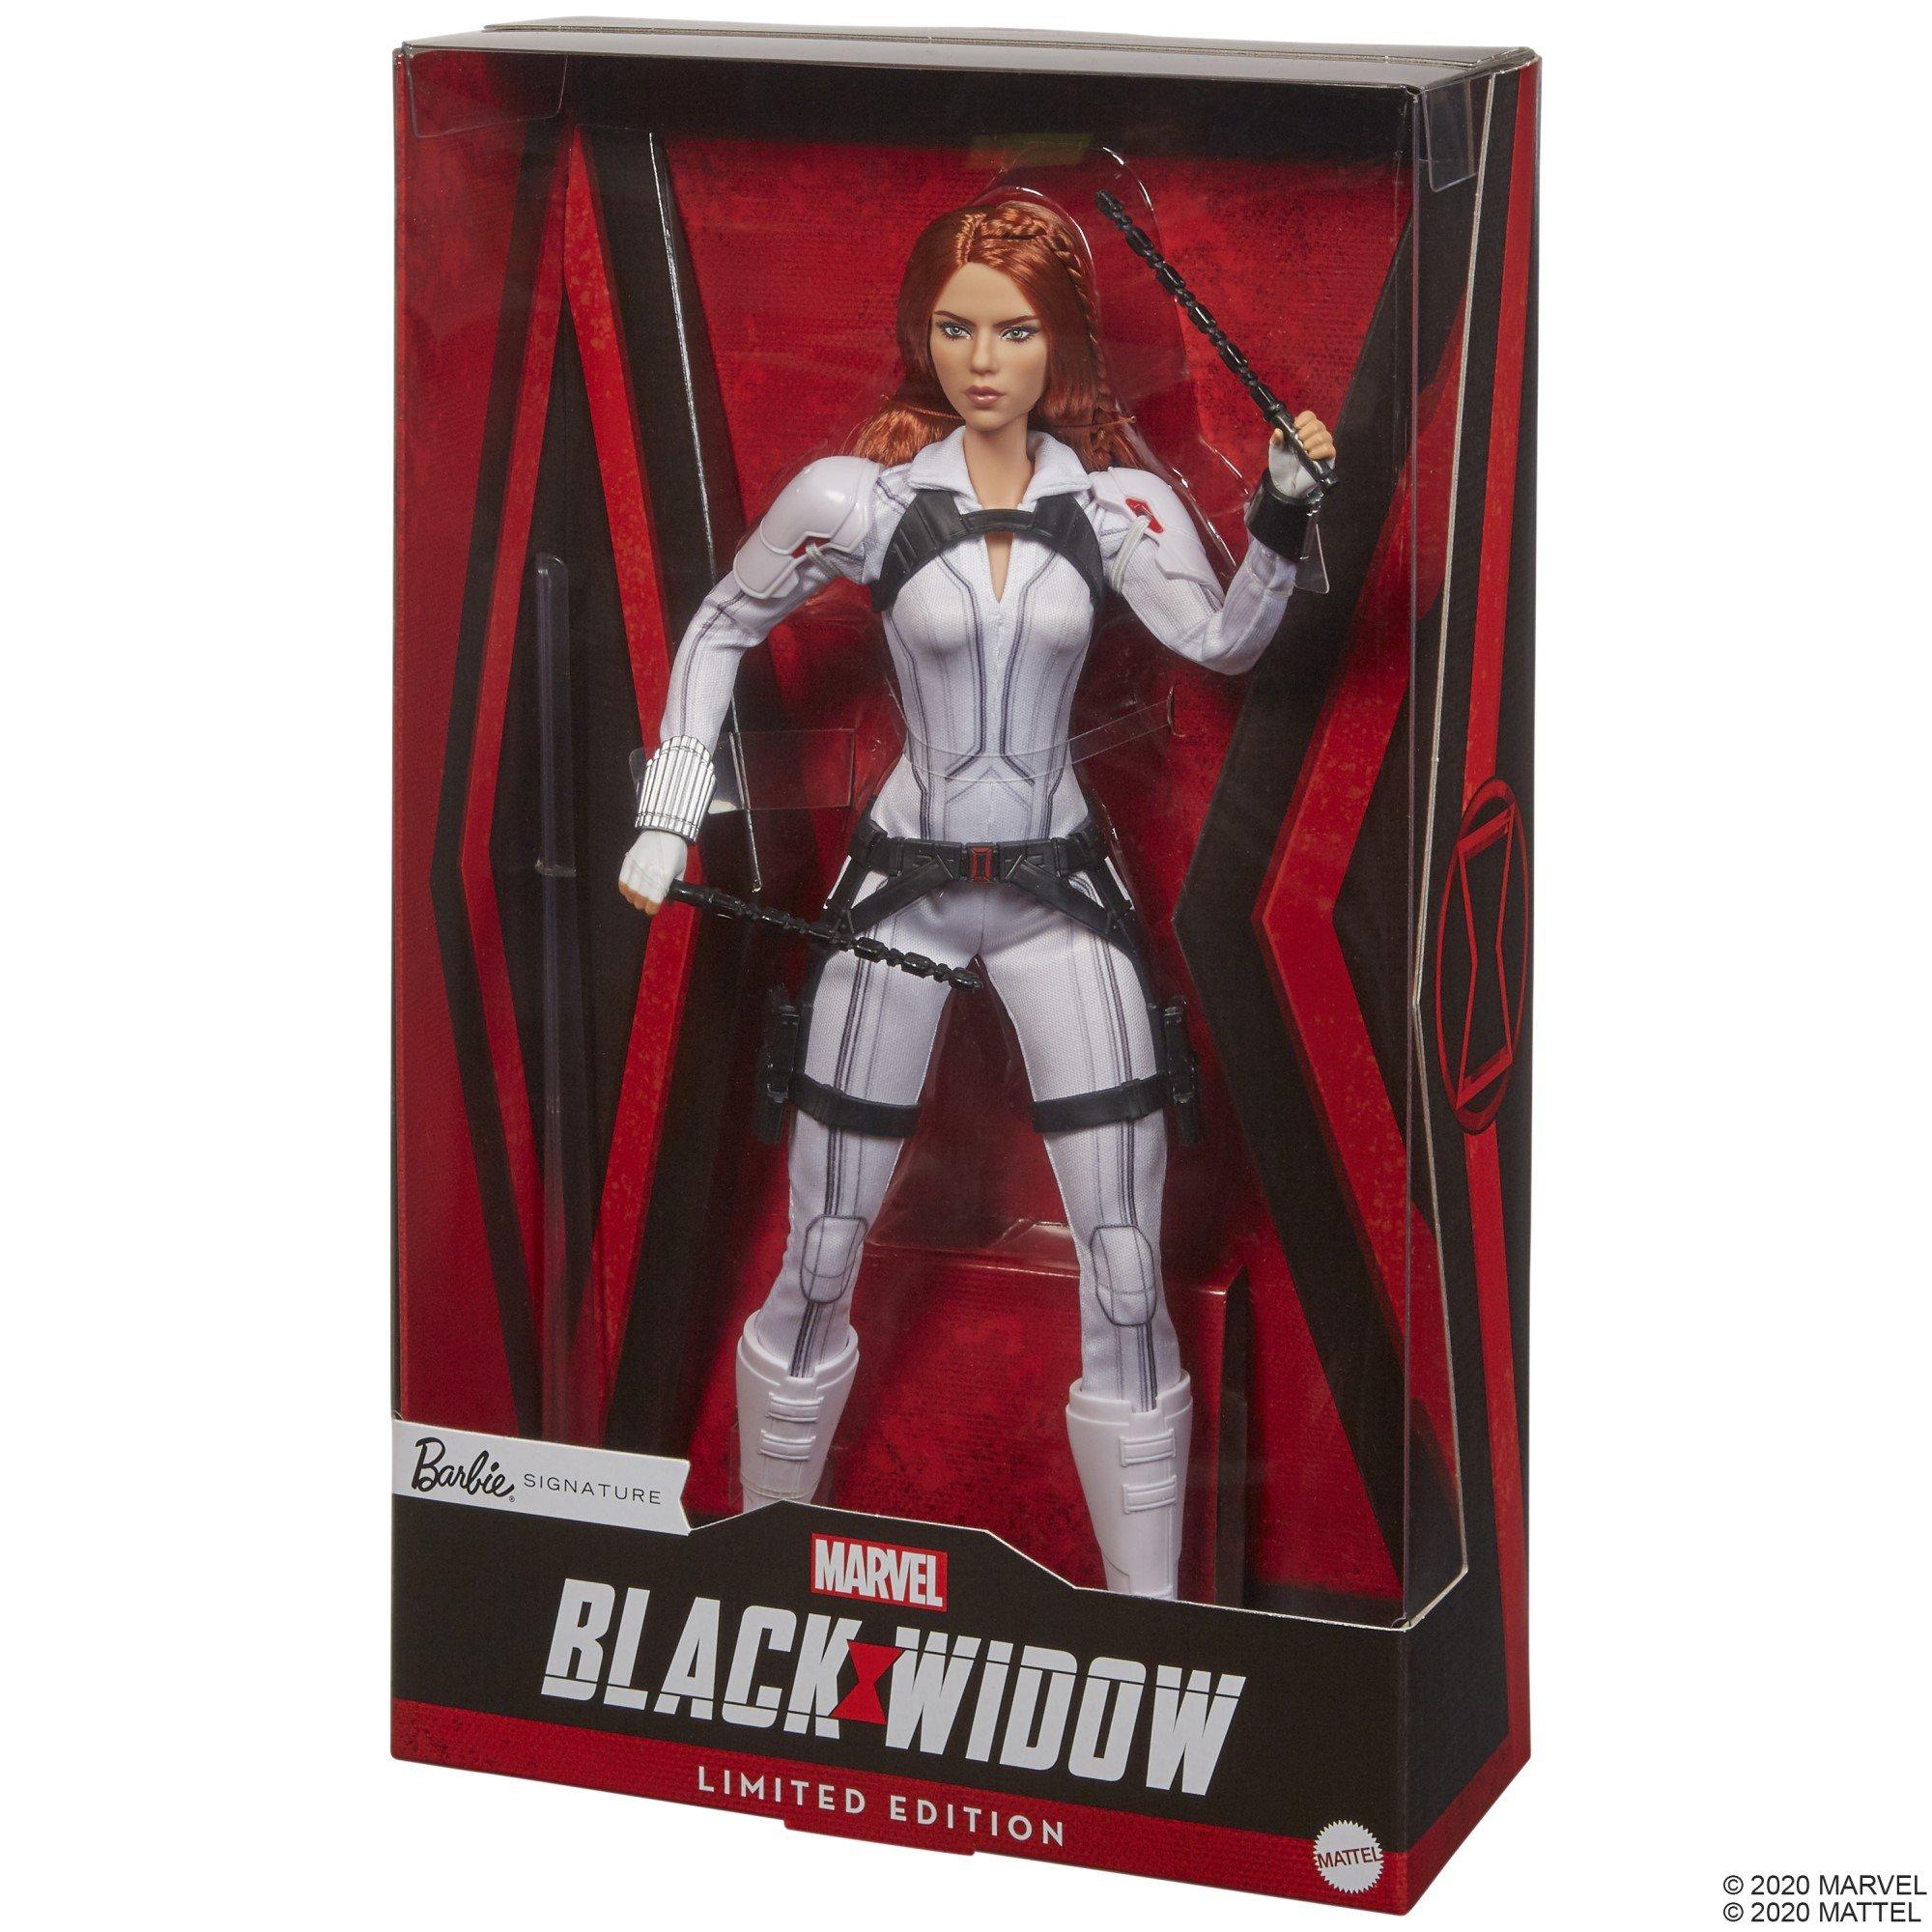 Black Widow gets her own Barbie doll 23